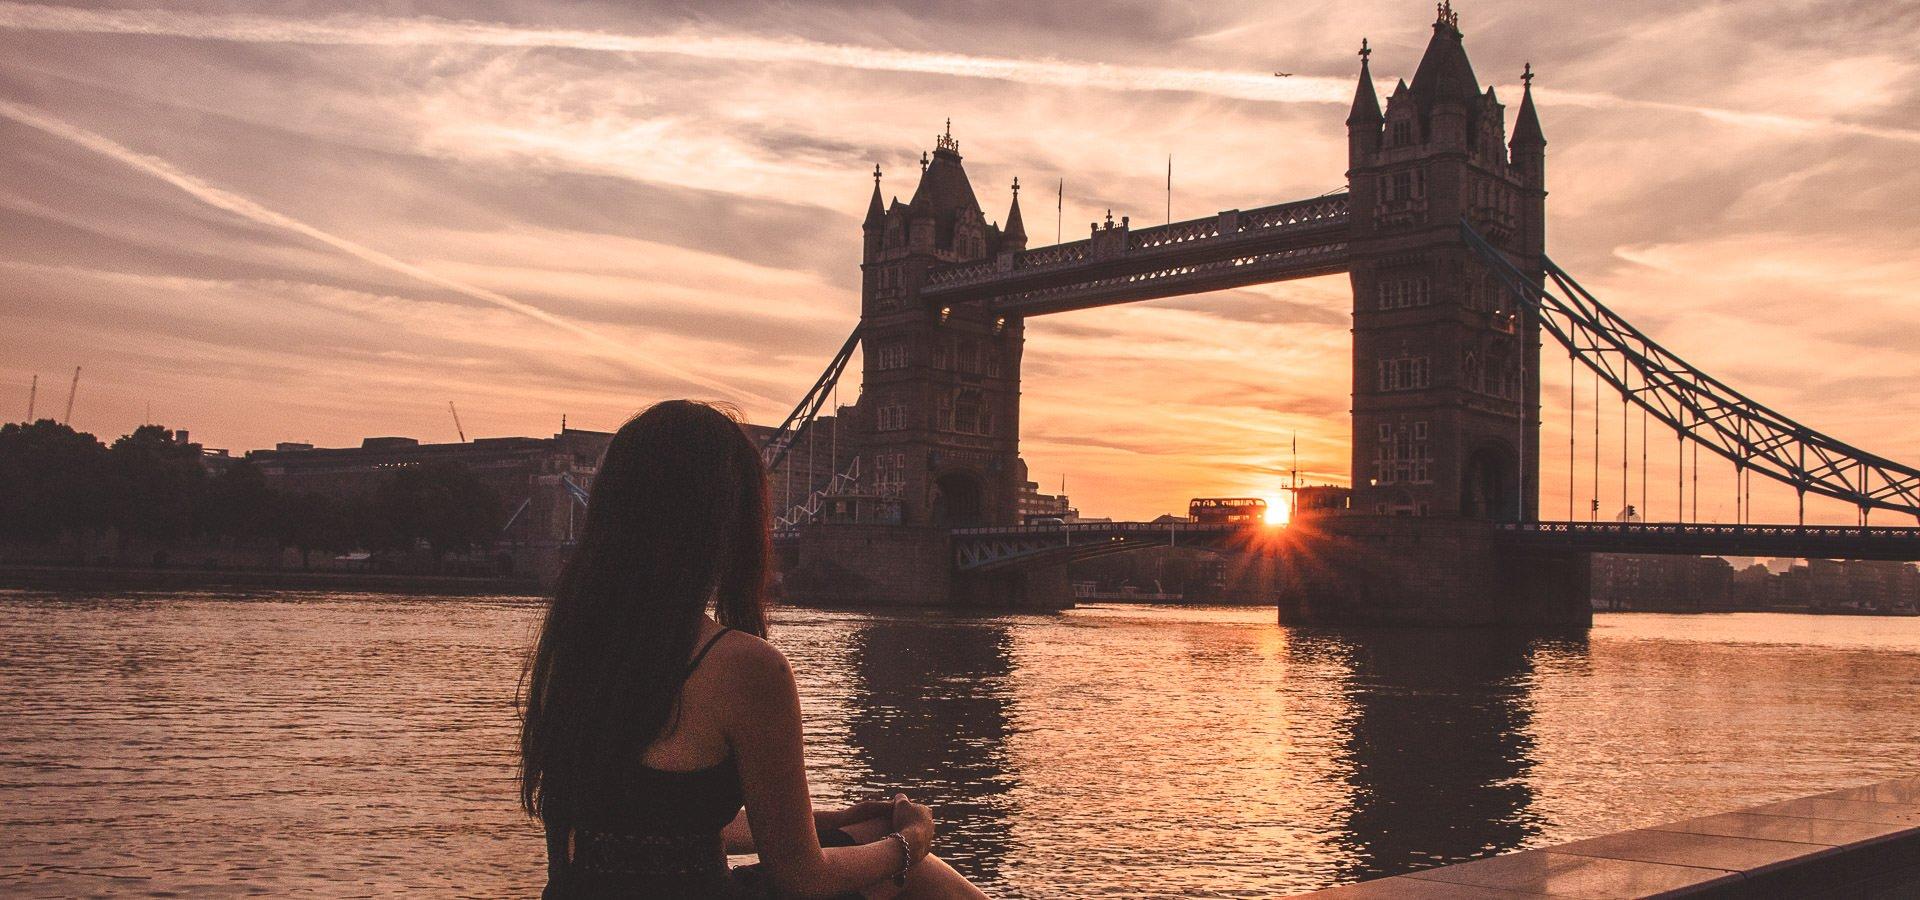 Sunrise at Tower Bridge | London Instagram Shots